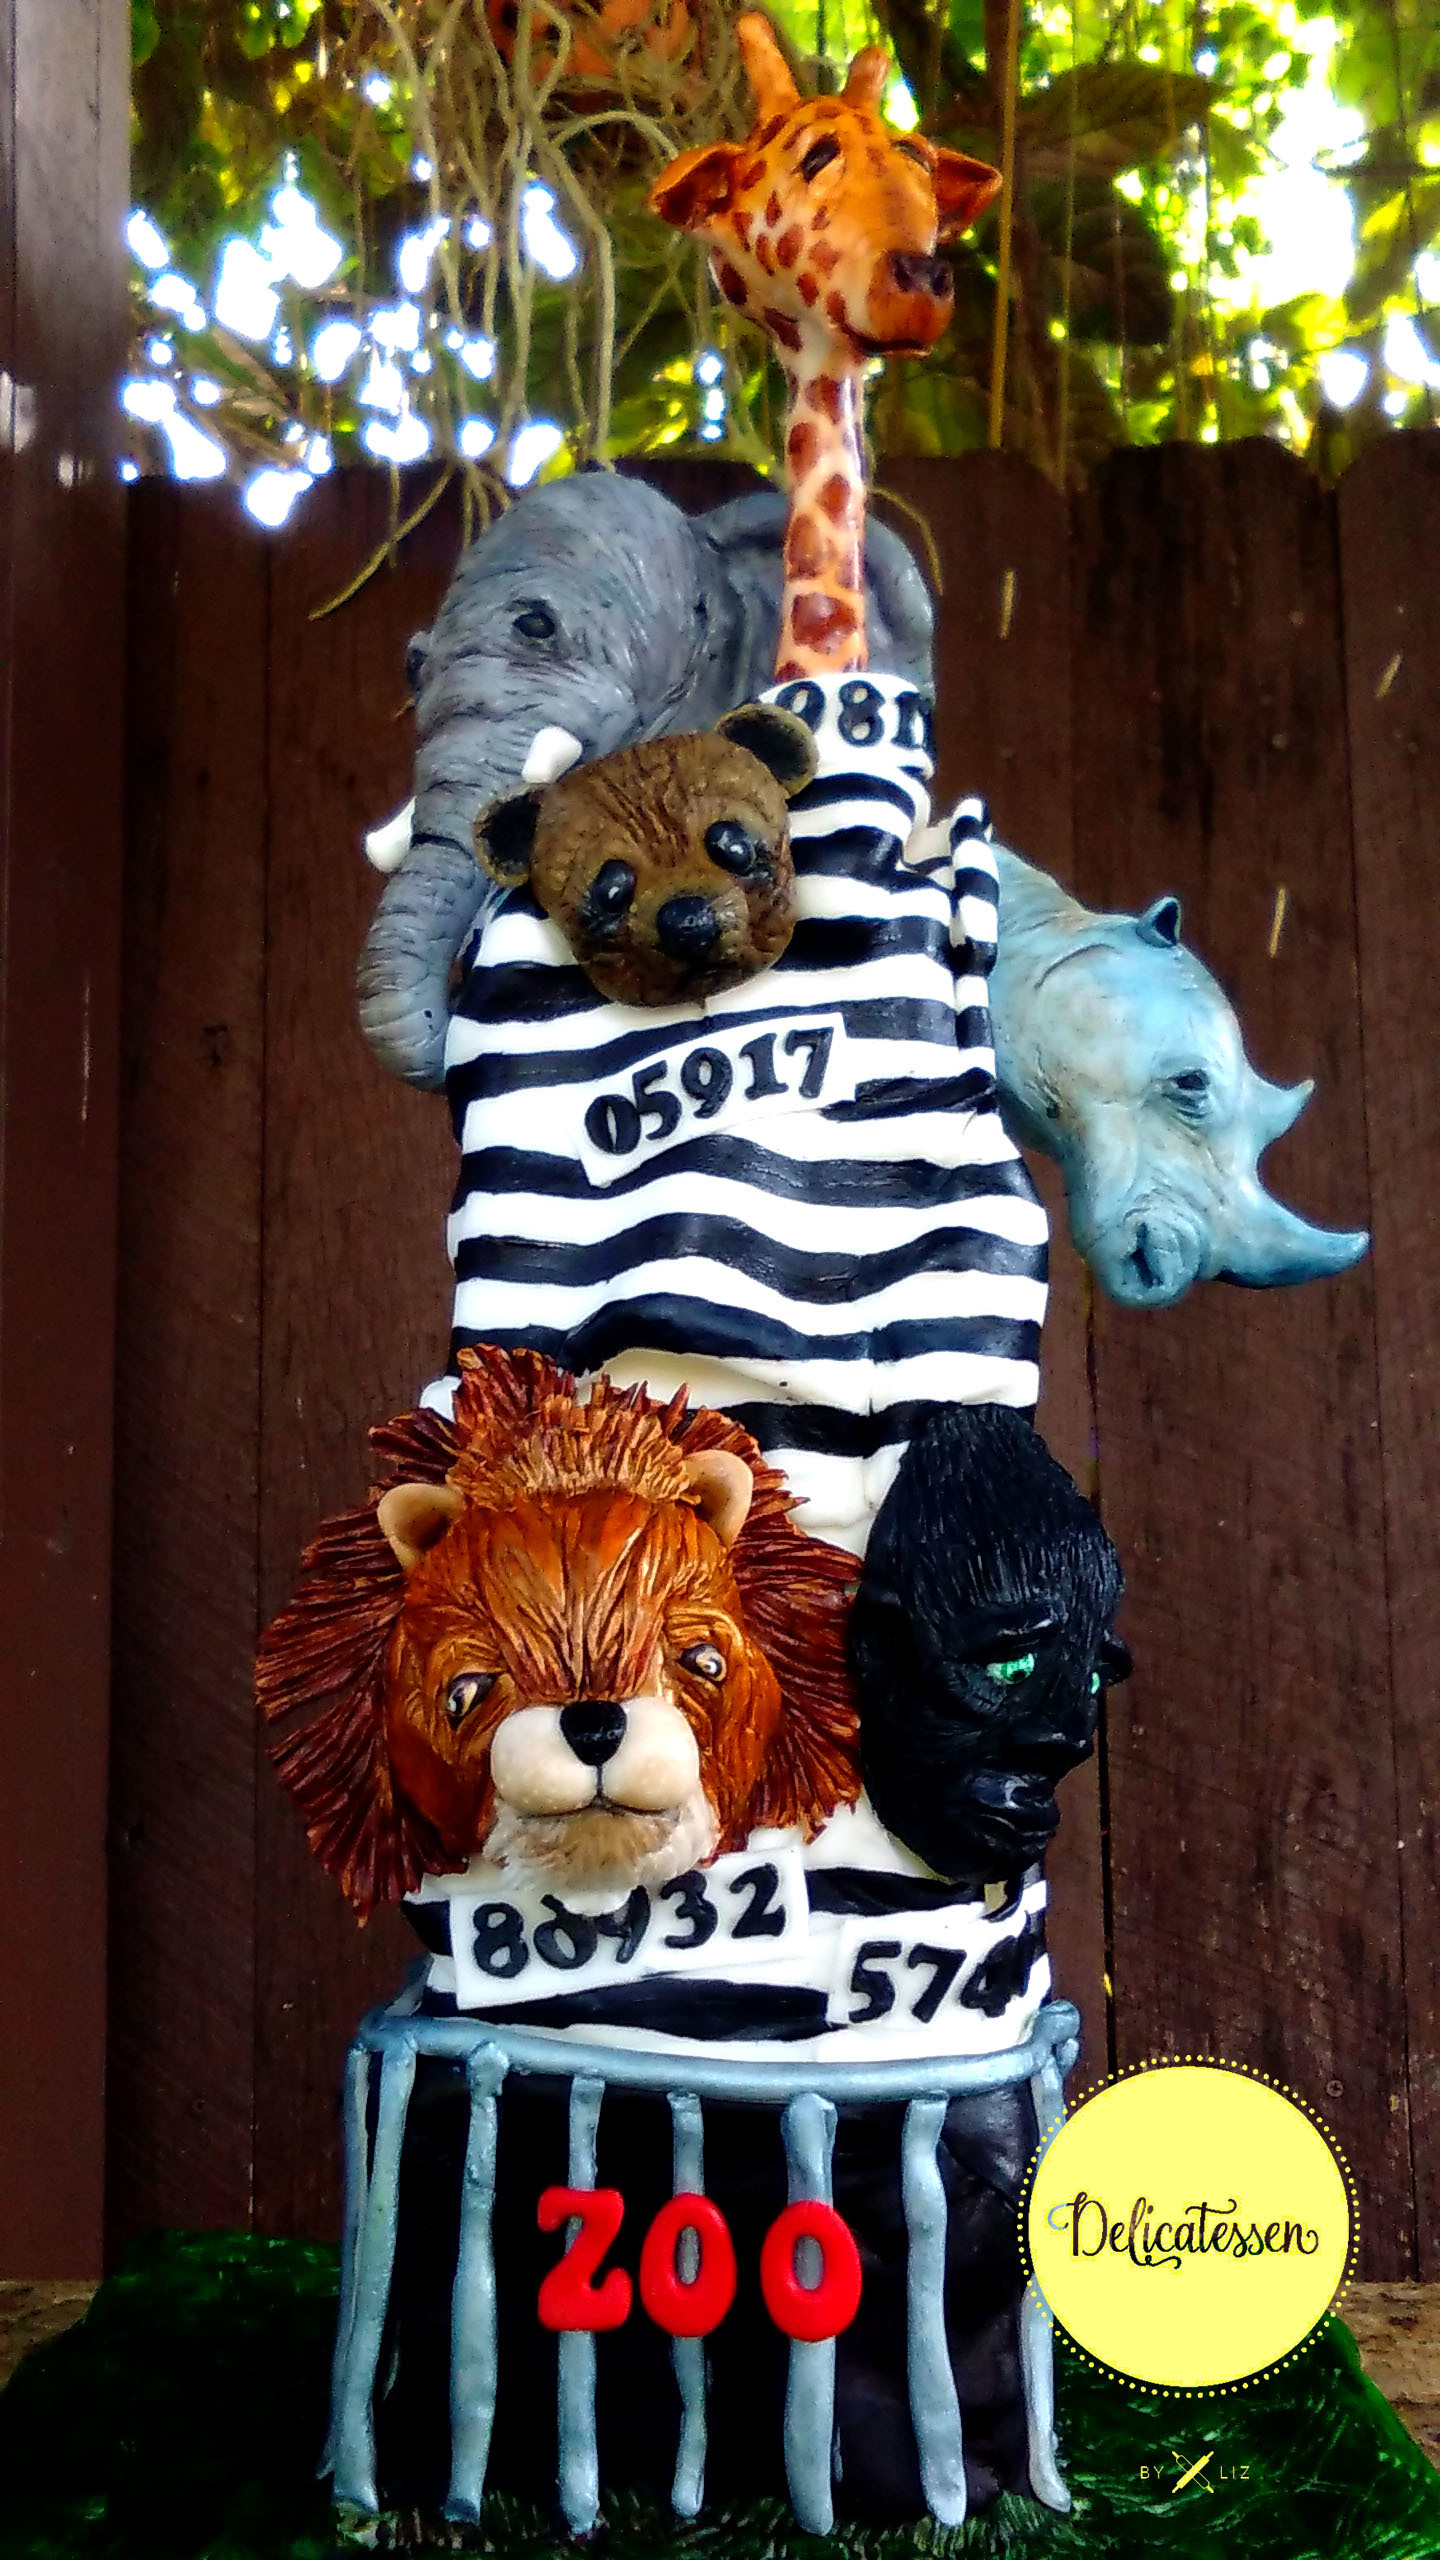 Animal-Rights-Lisbet-Lorenzo-de-la-Riva-Delicatessen-by-Liz-Zoo-Animals.jpg#asset:13723